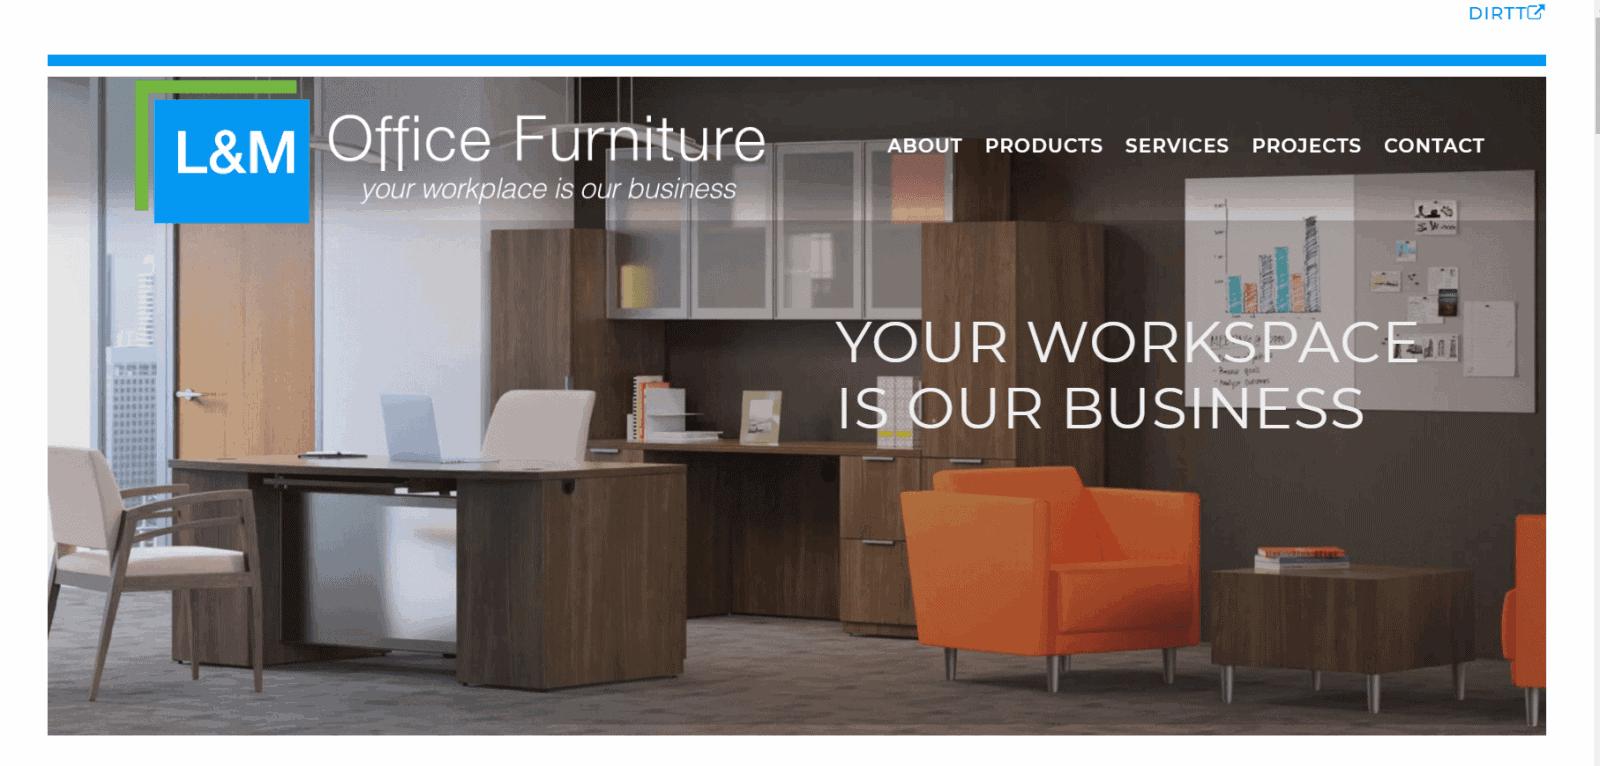 L M Office Furniture Website Design Tulsa Website Design Mcwilliams Media